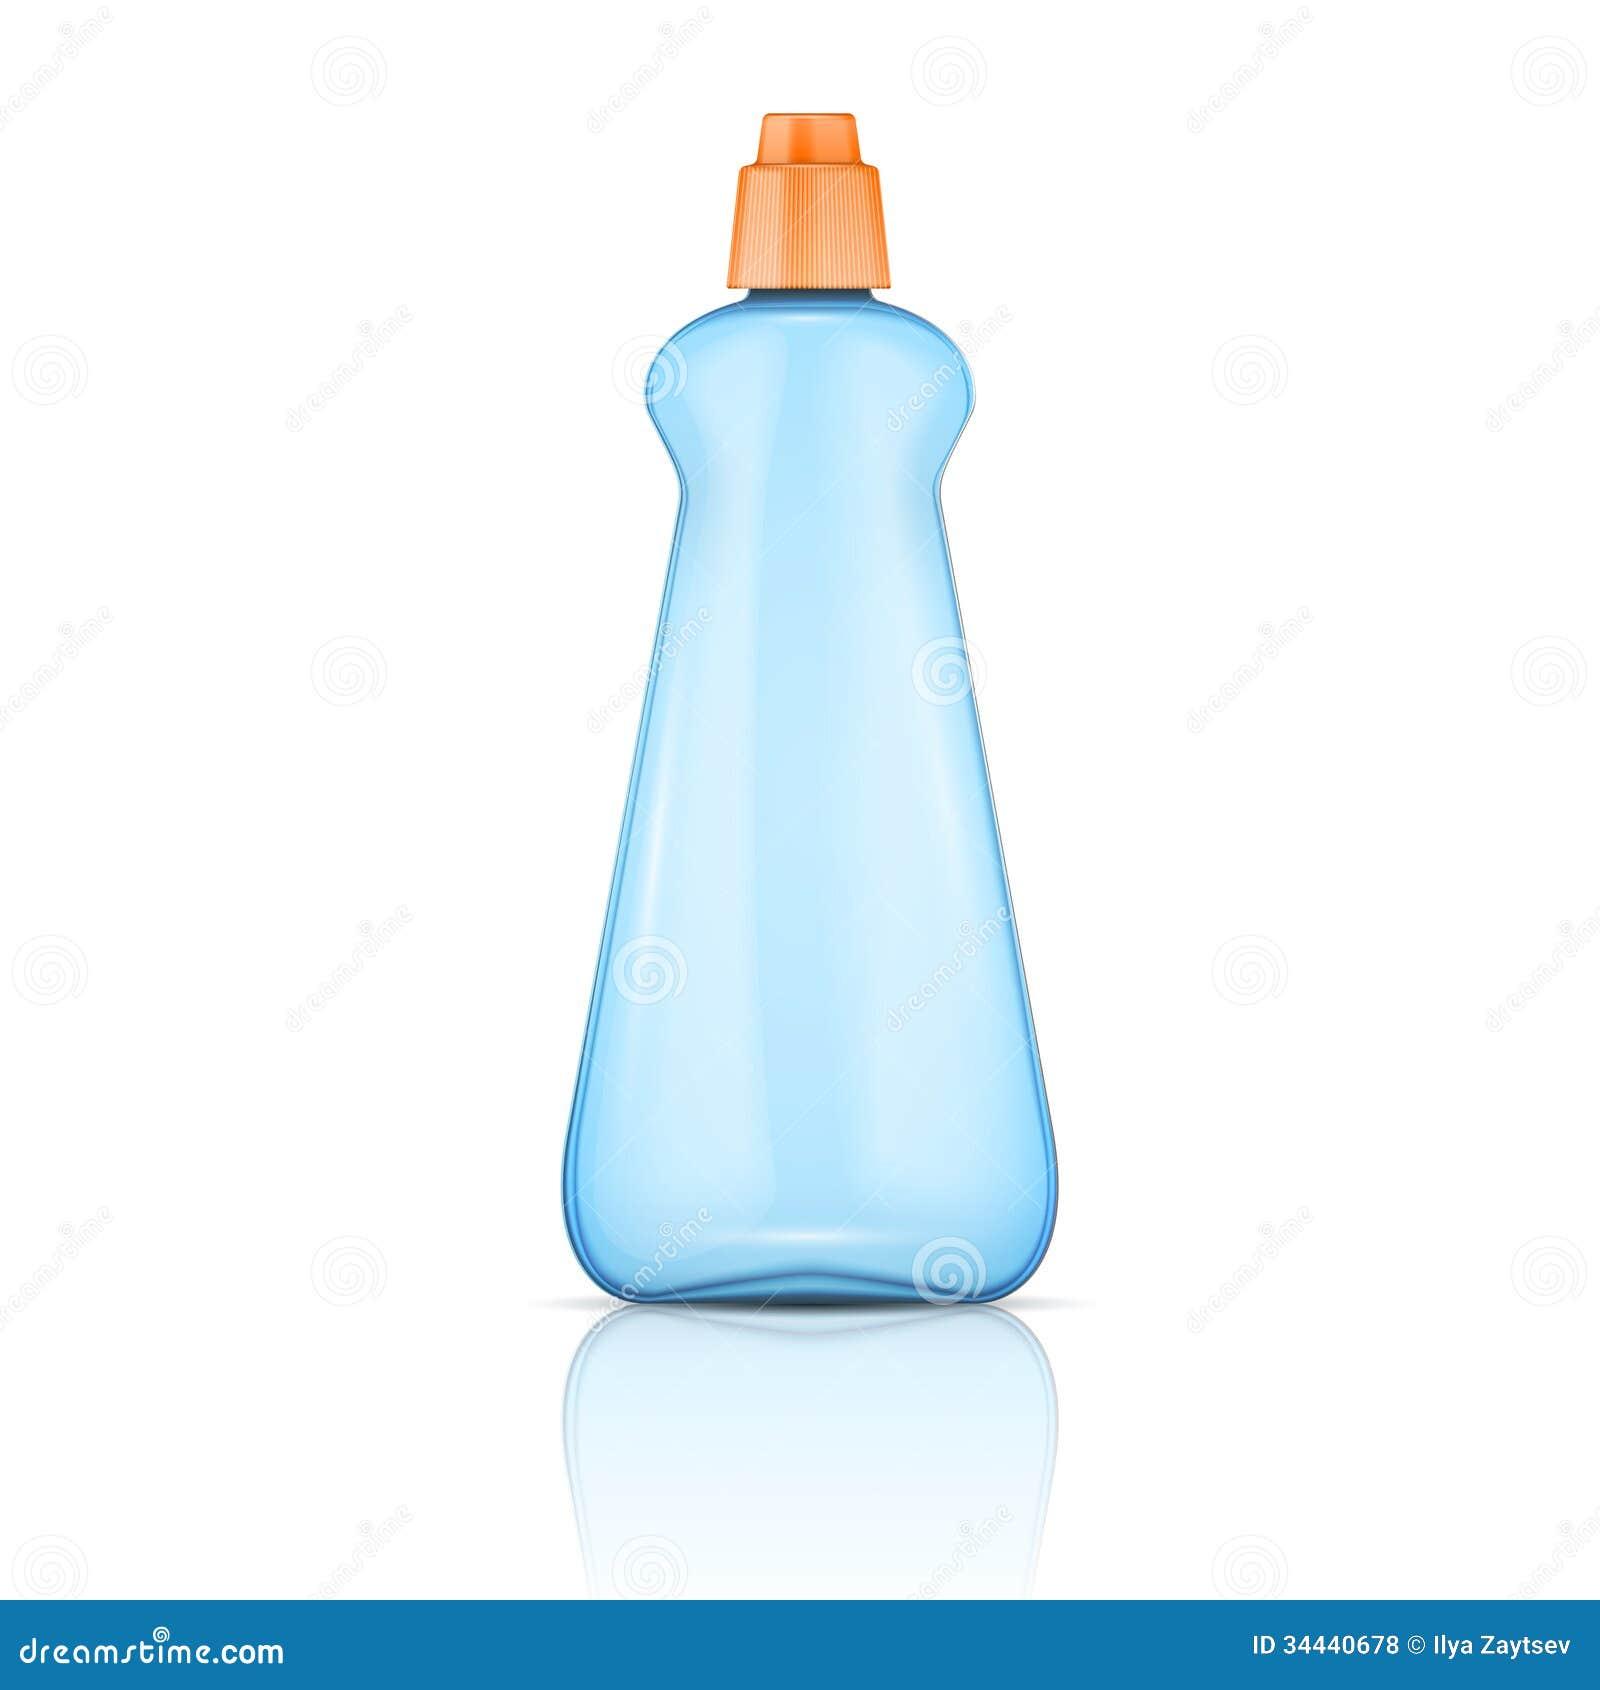 Blue plastic bottle with Plastic Bottle Vector